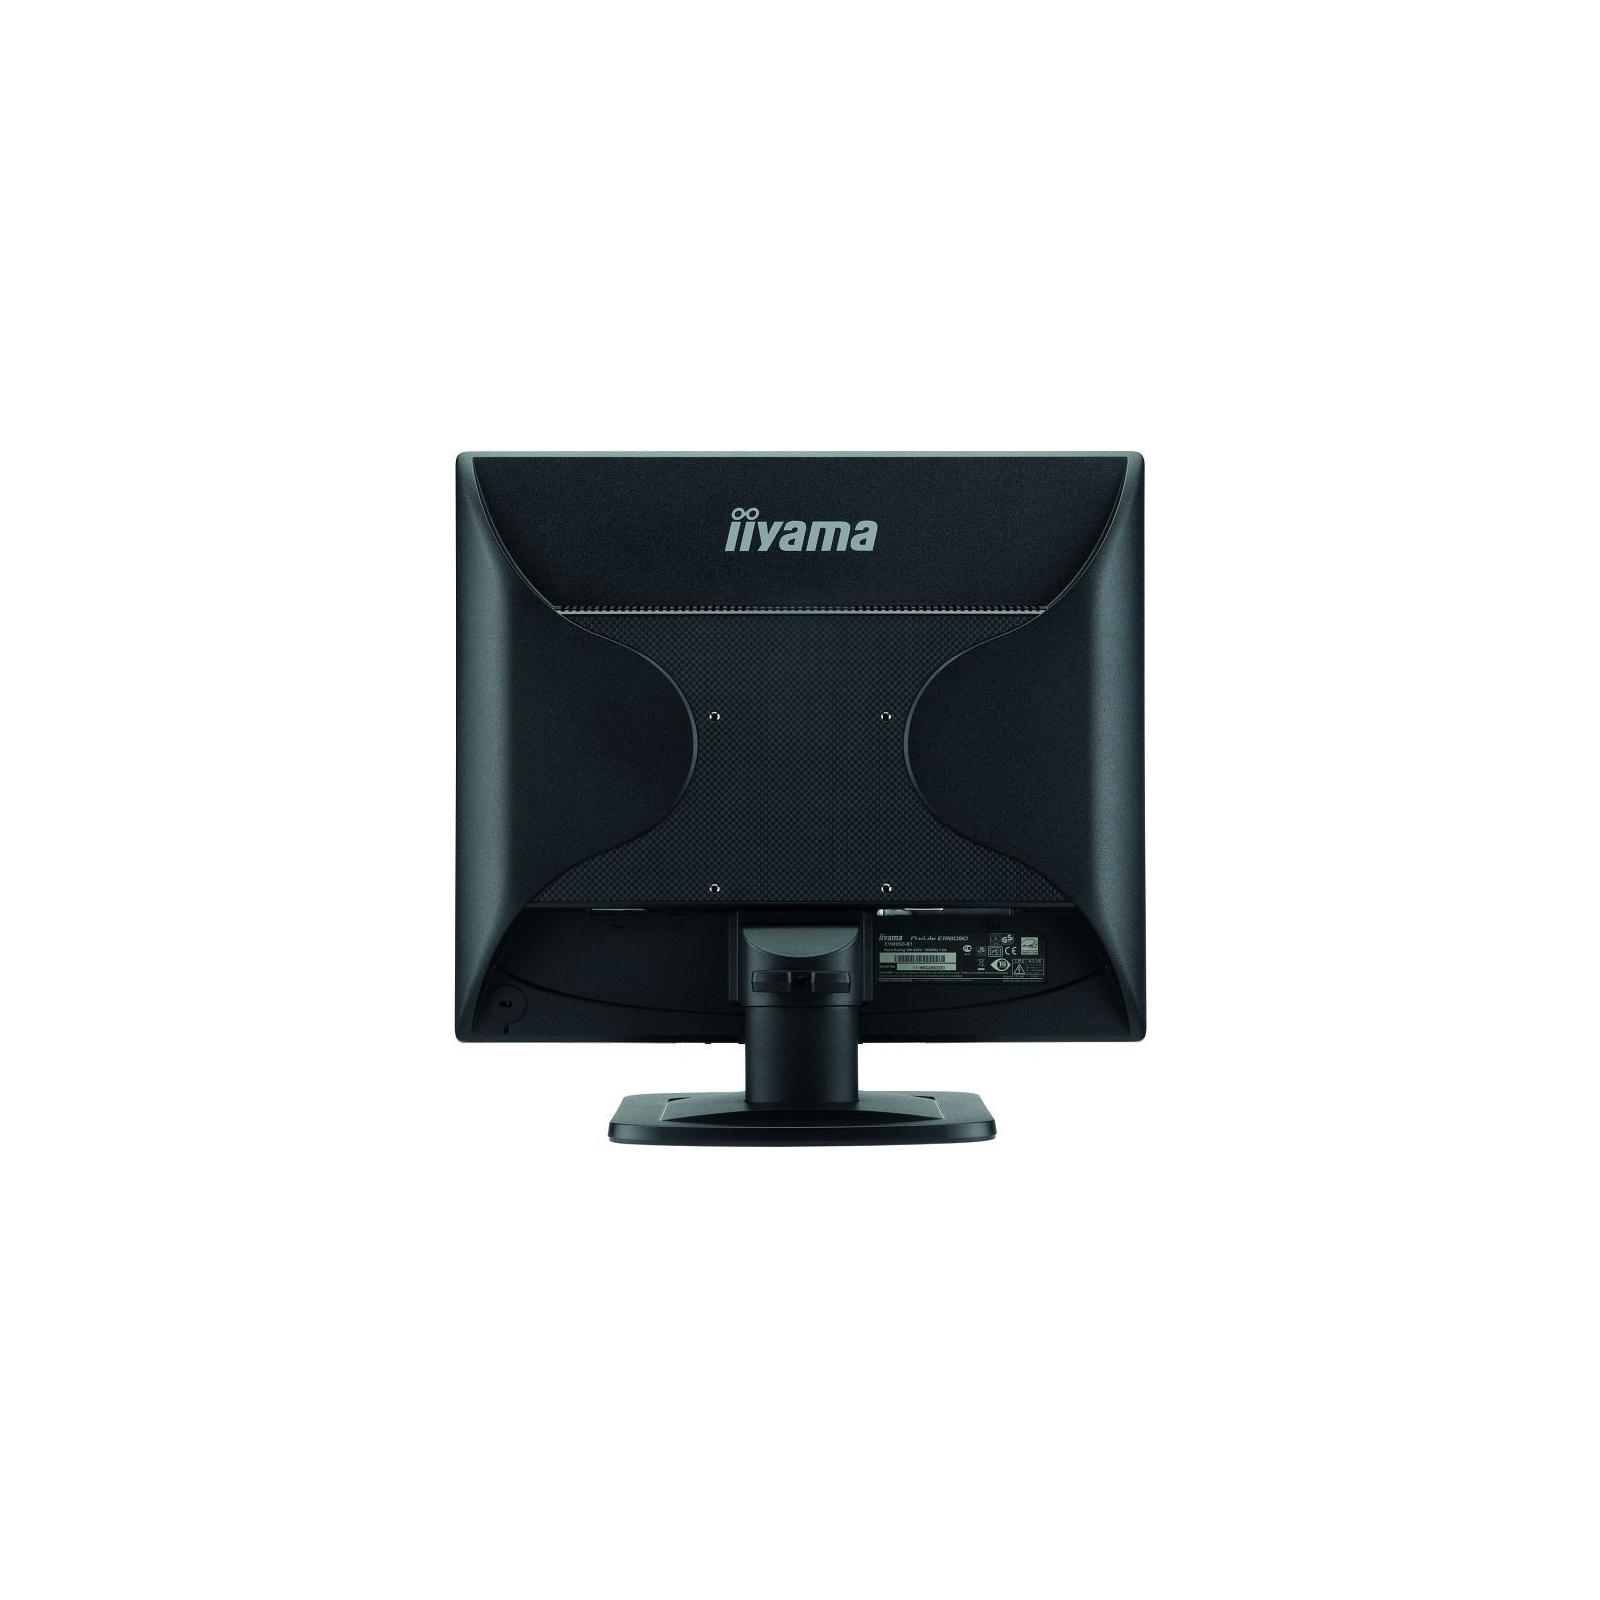 Монитор iiyama E1980SD-B1 изображение 5